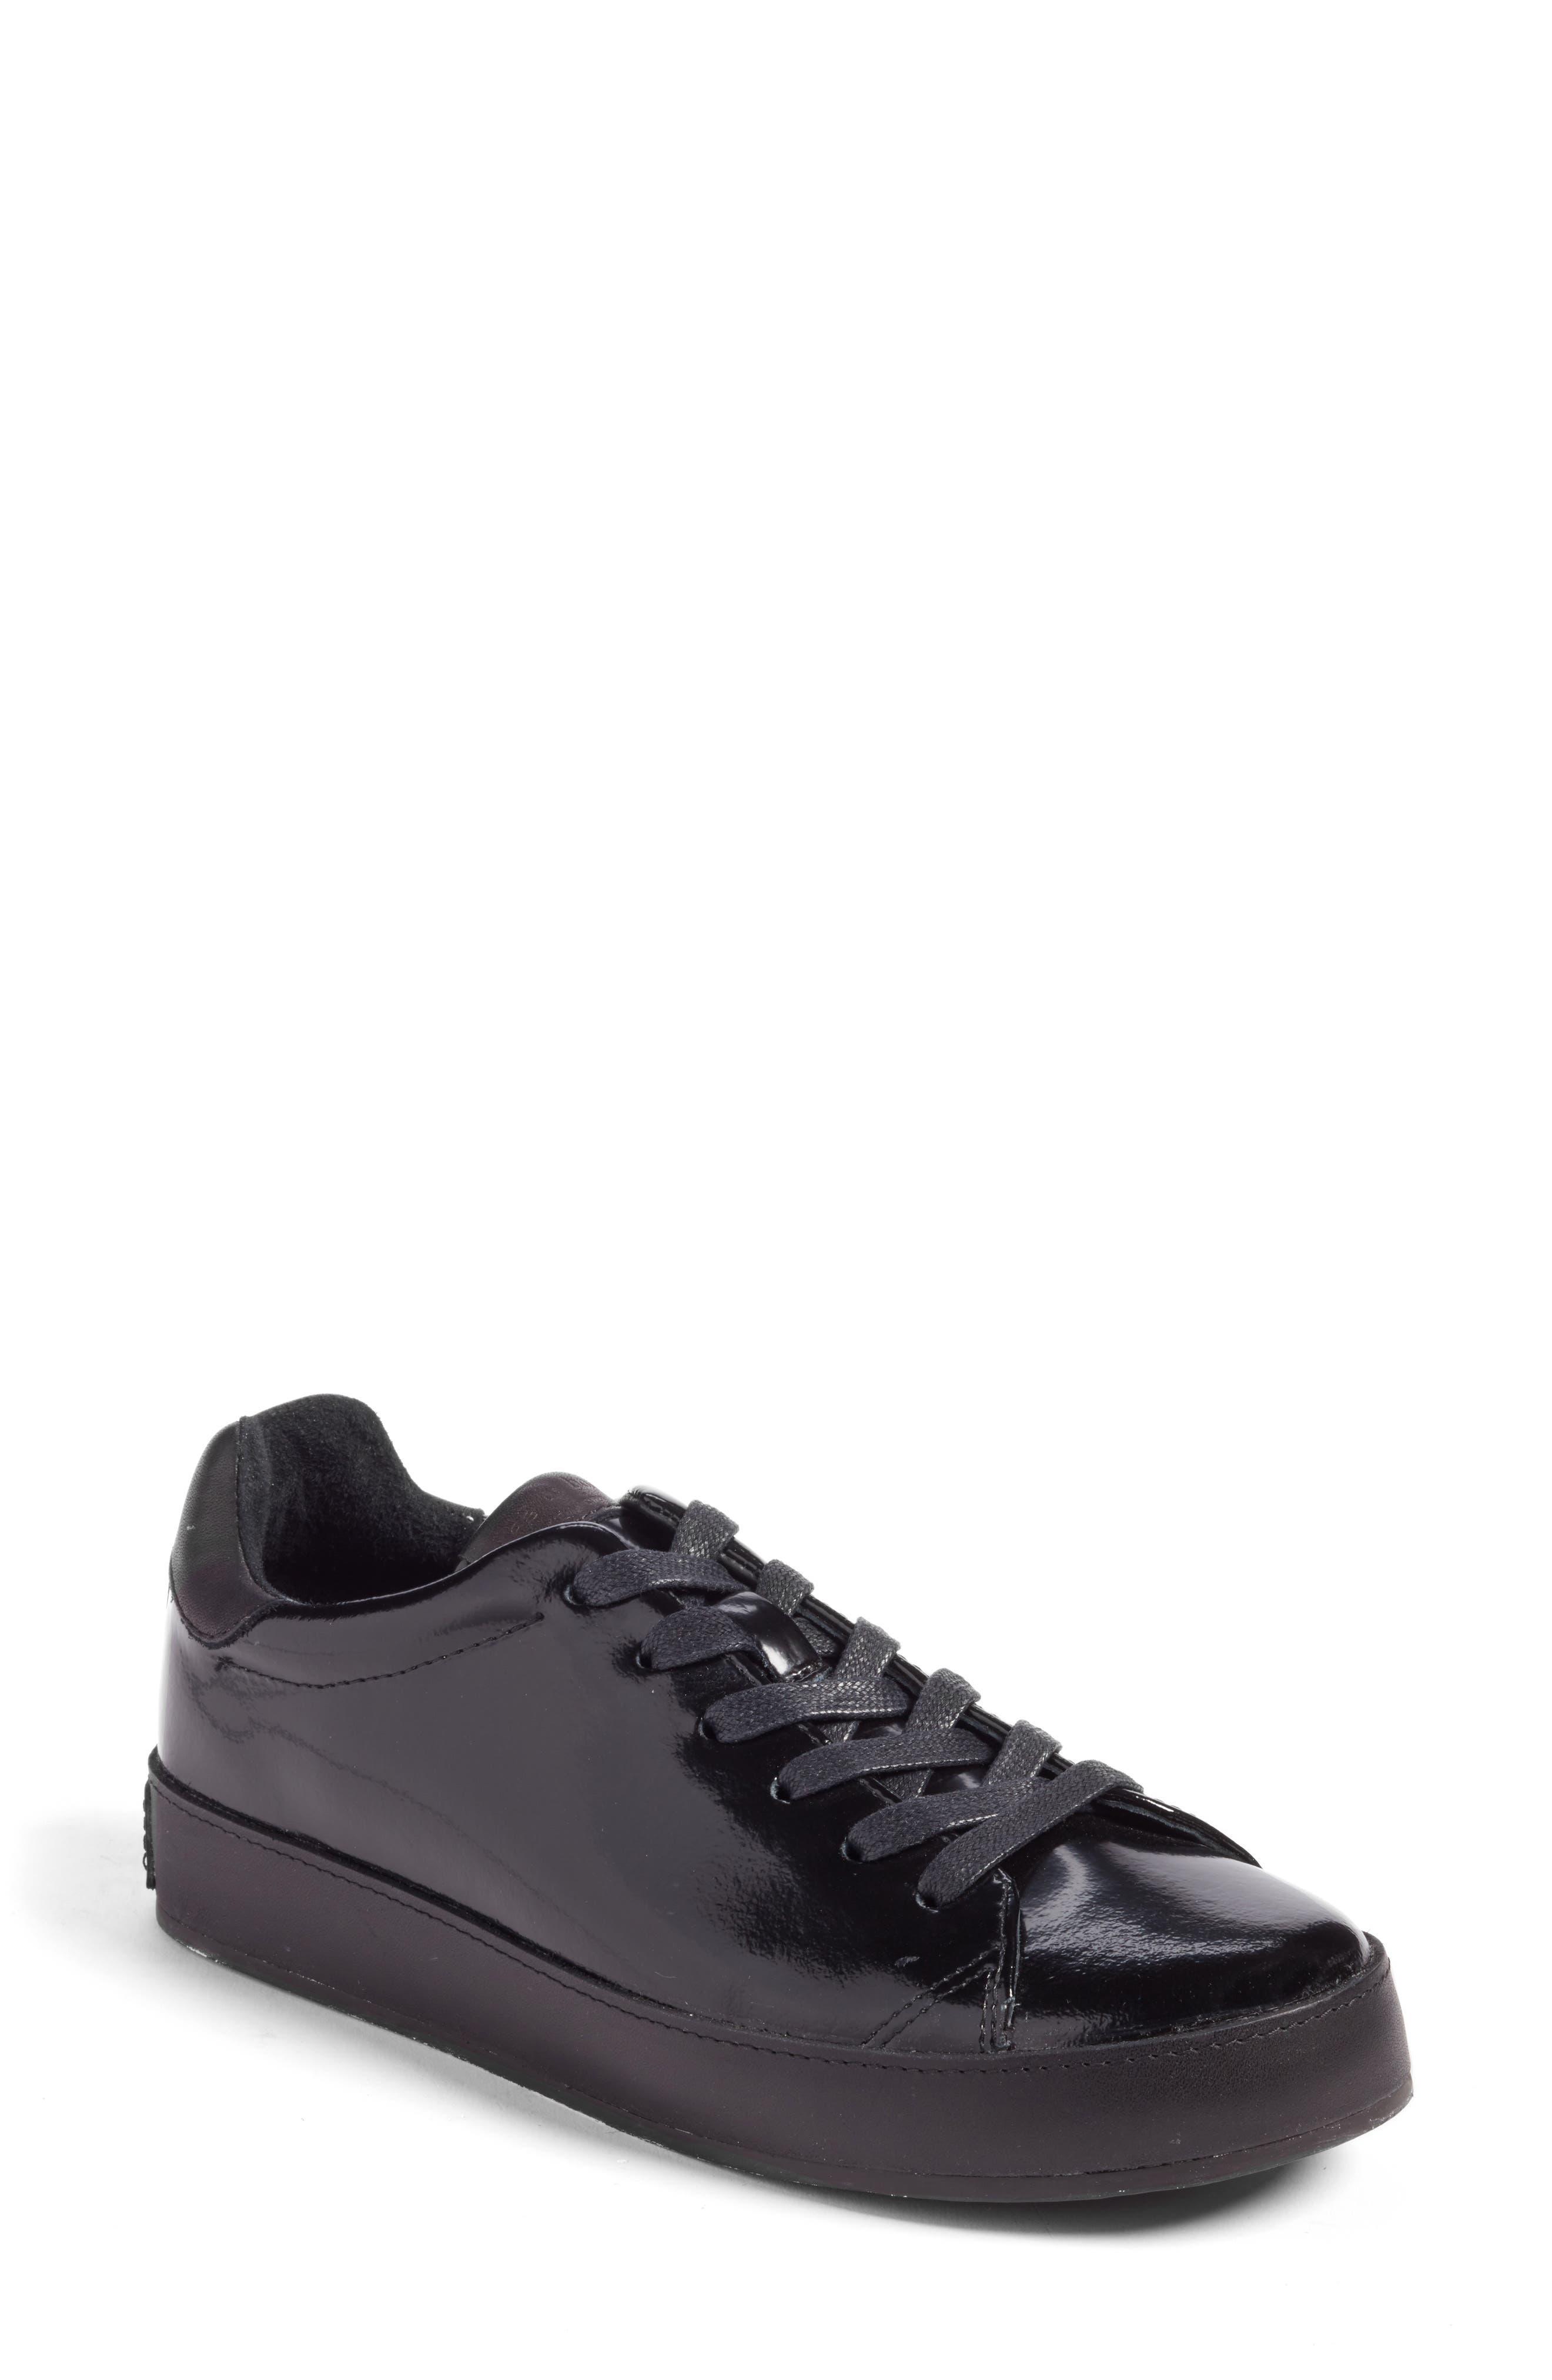 RB1 Low-Top Sneaker,                         Main,                         color, 001